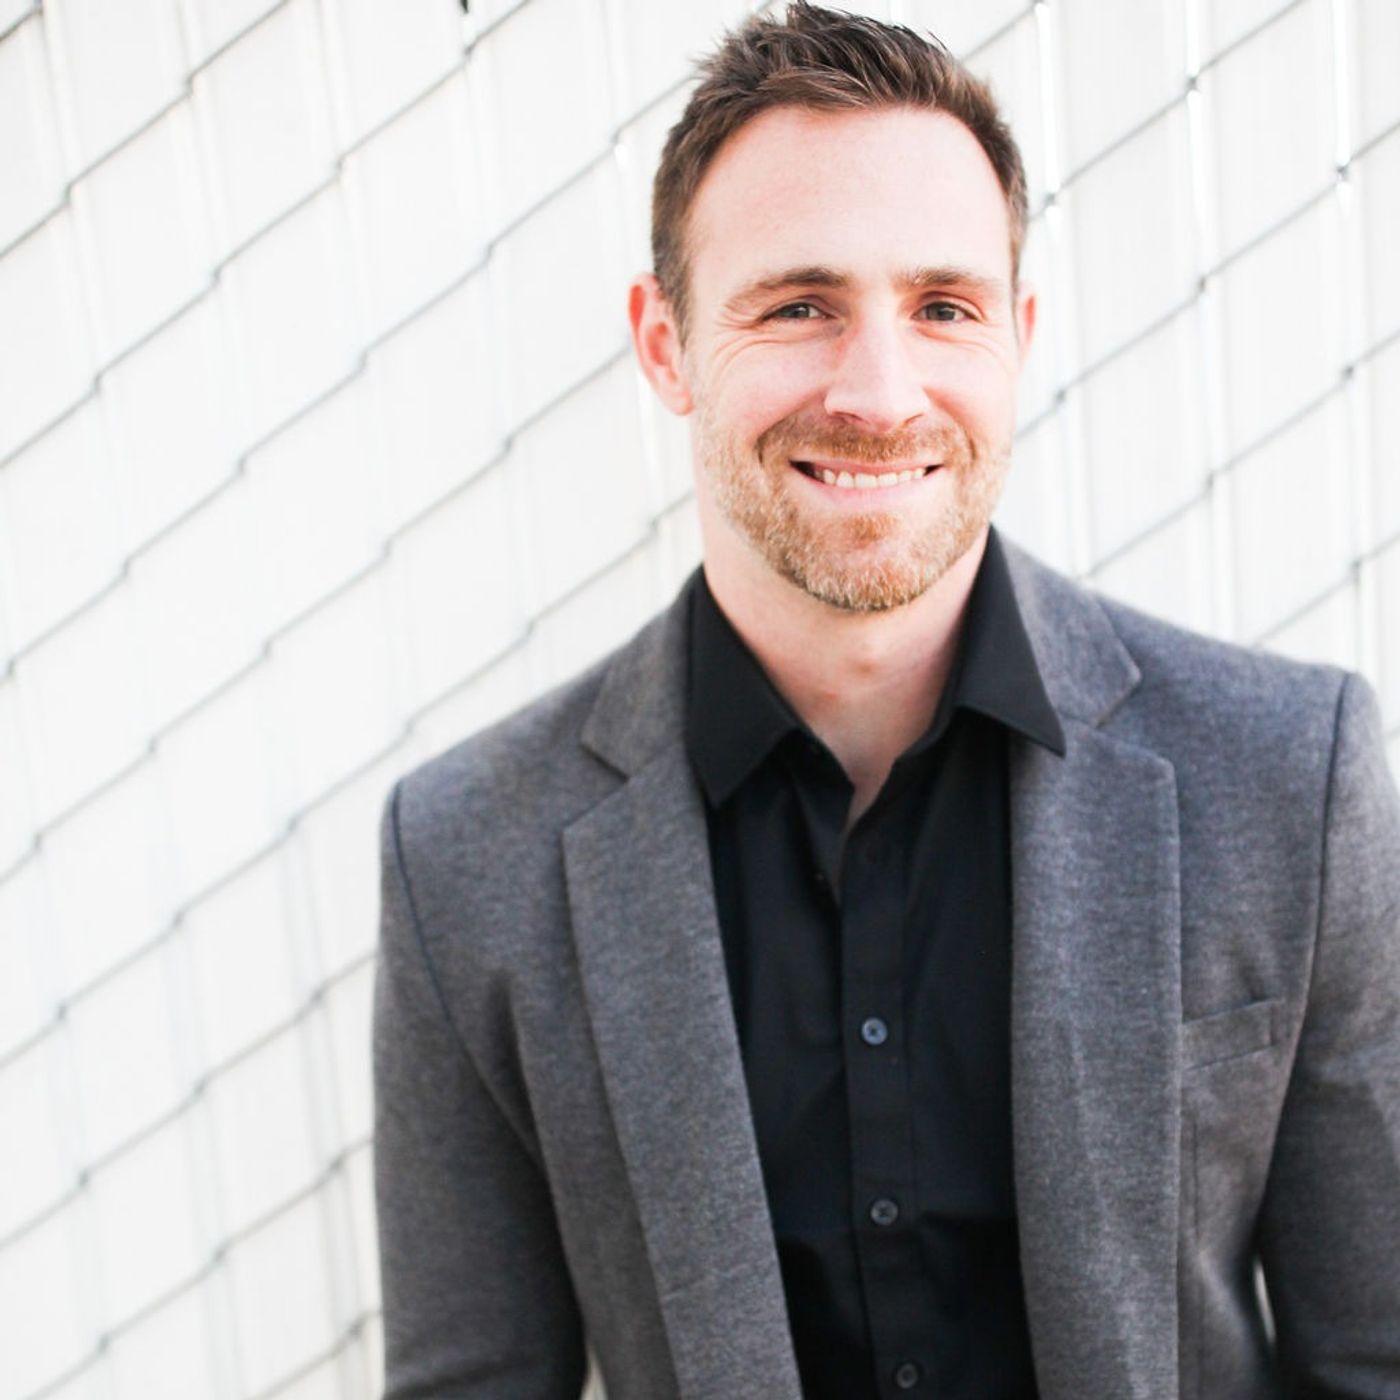 Interview with Matt Johnson